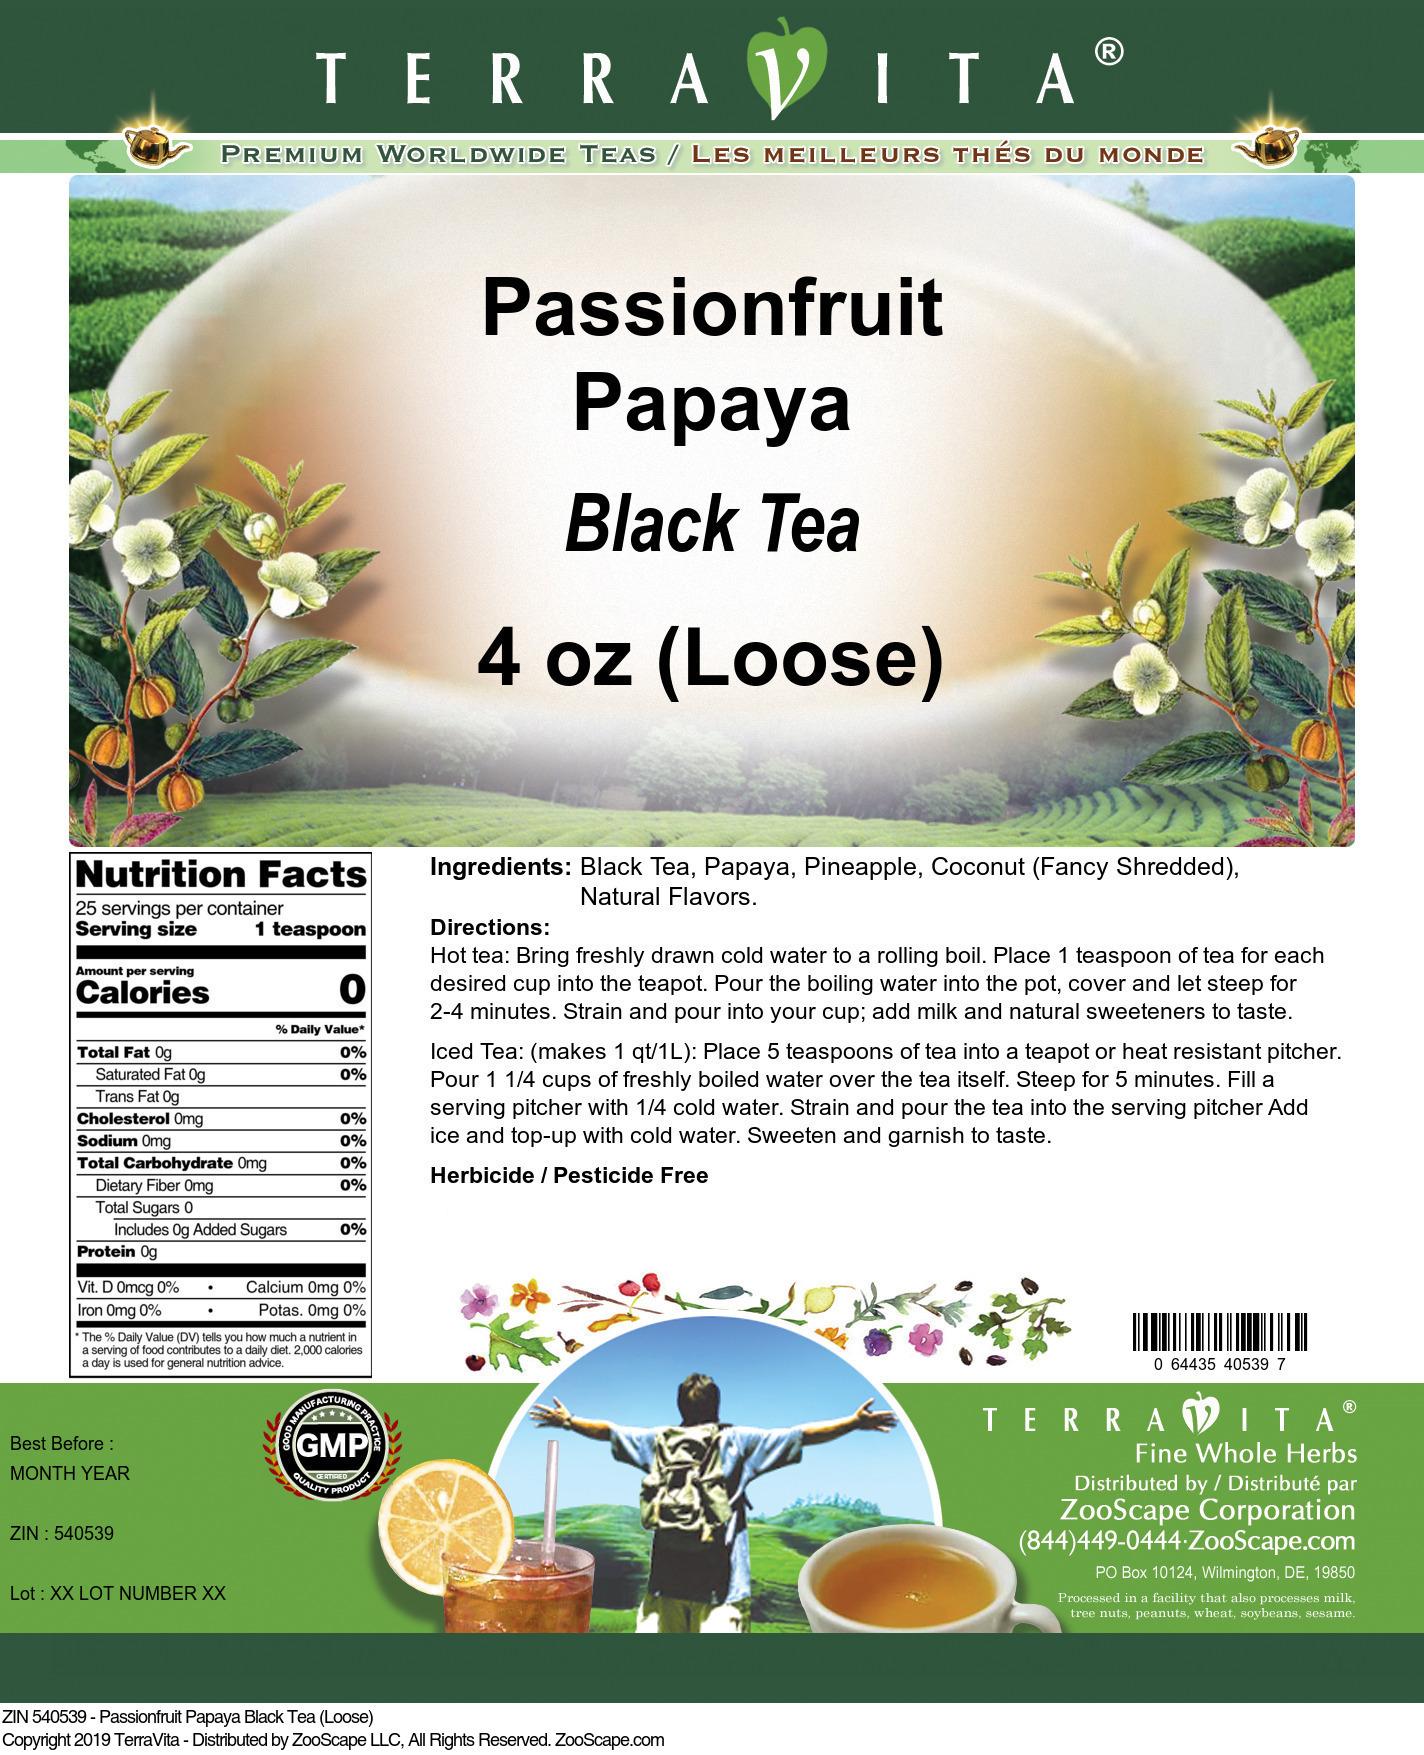 Passionfruit Papaya Black Tea (Loose)